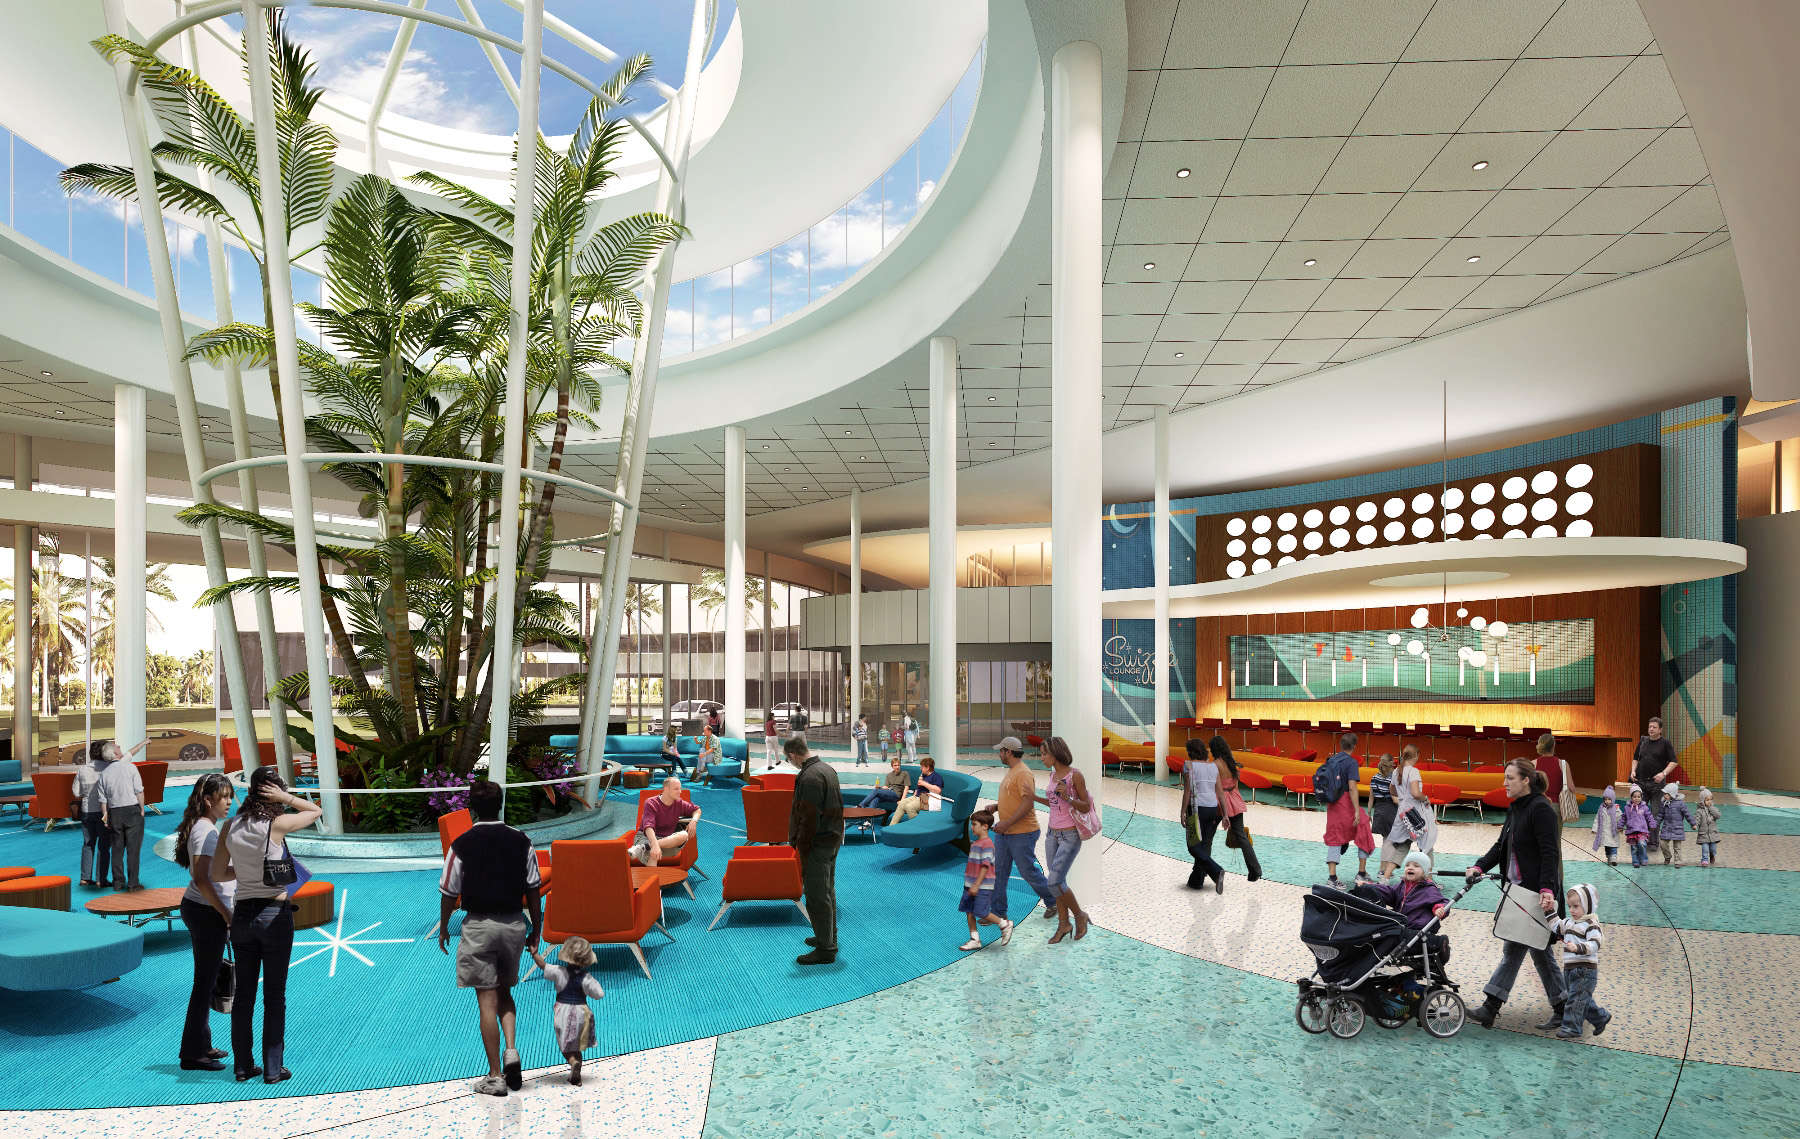 Universal Cabana Beach Hotel Review